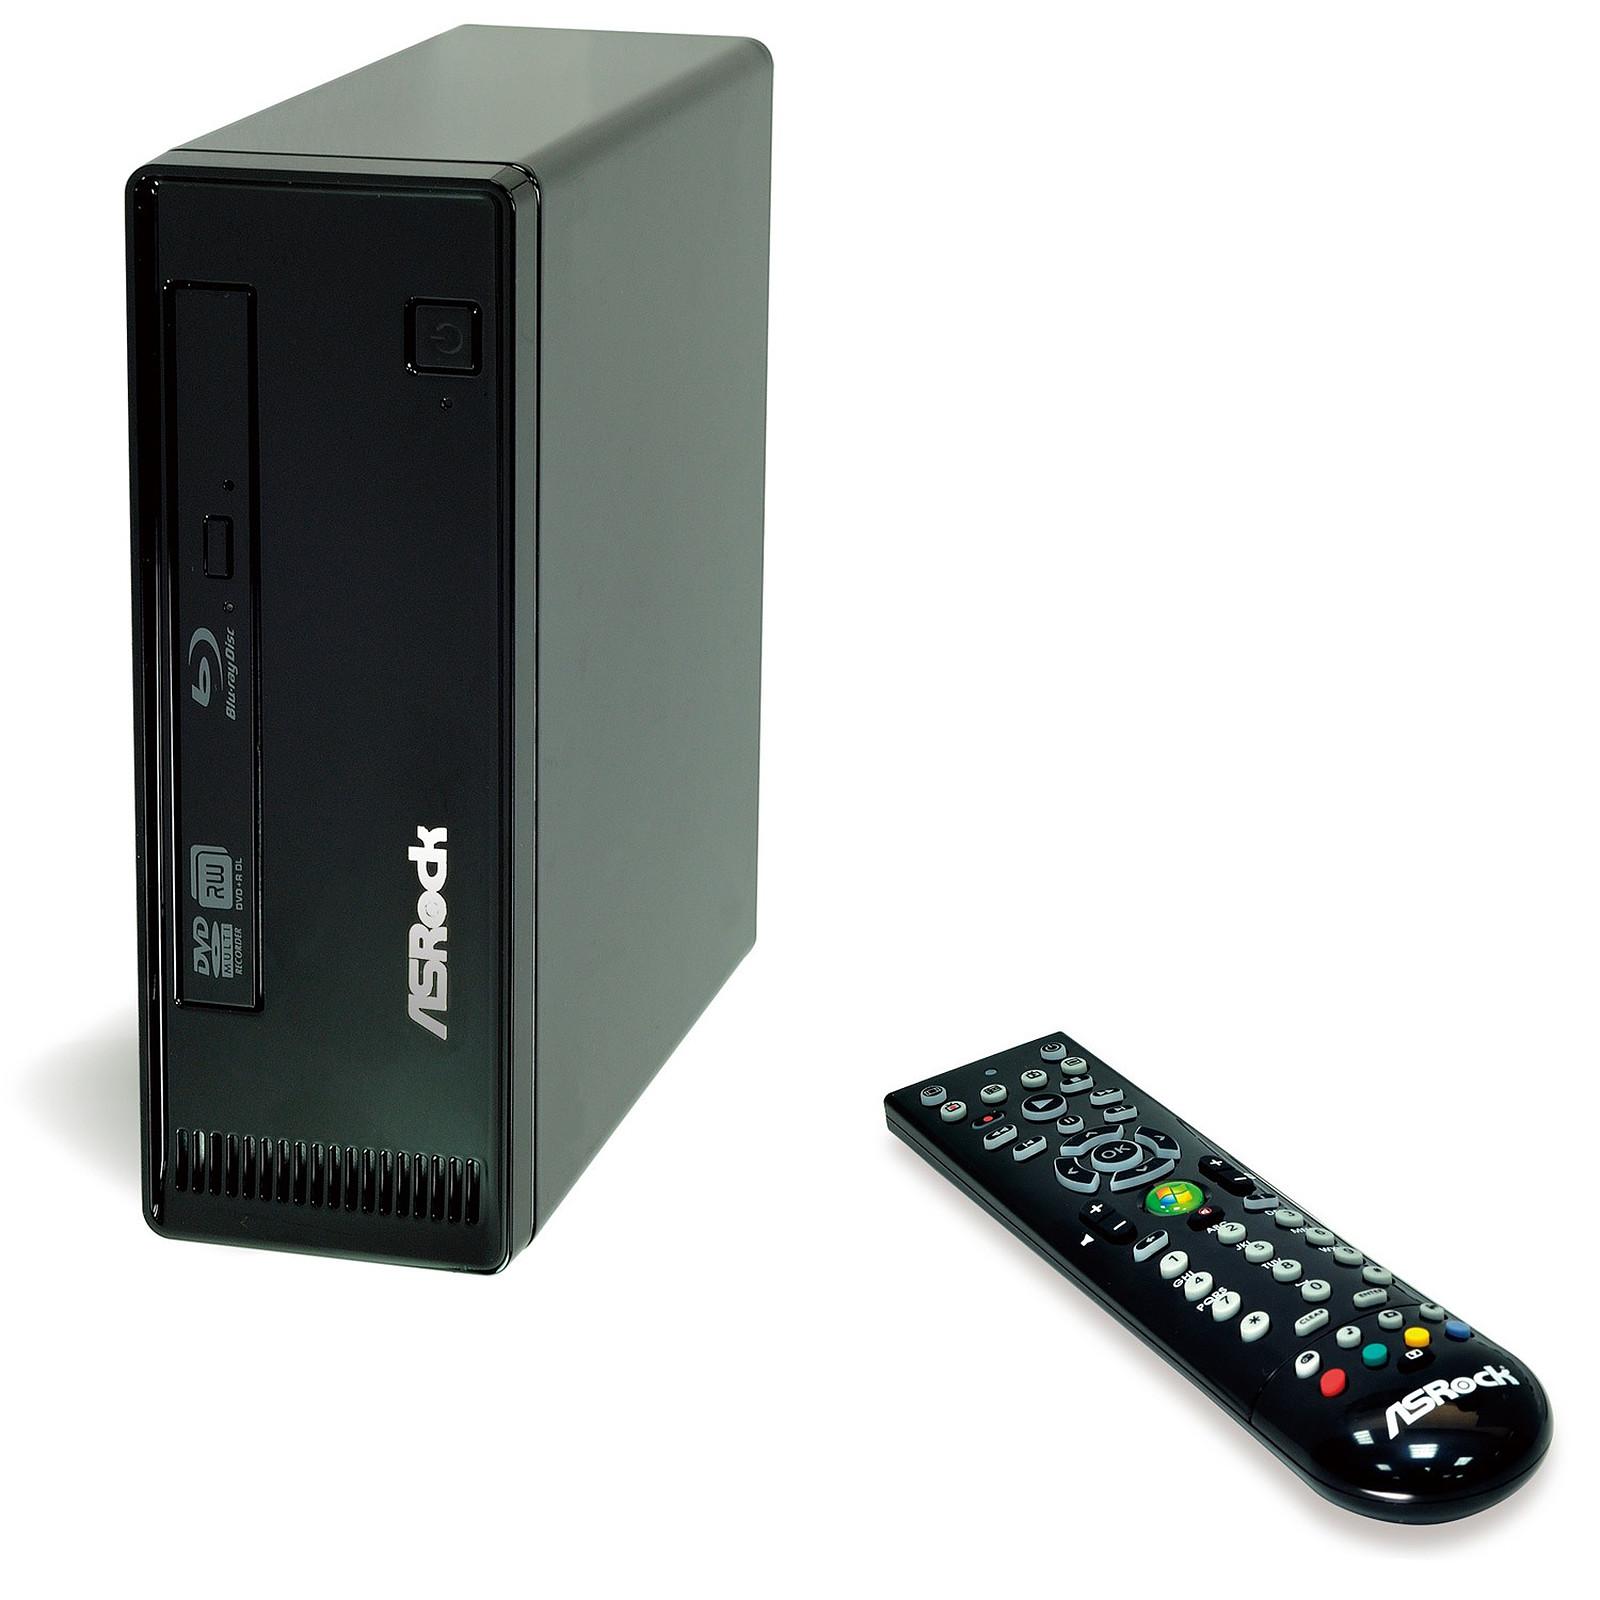 DRIVERS FOR ASROCK ION 330HT/W7HP NETTOP REALTEK HD AUDIO